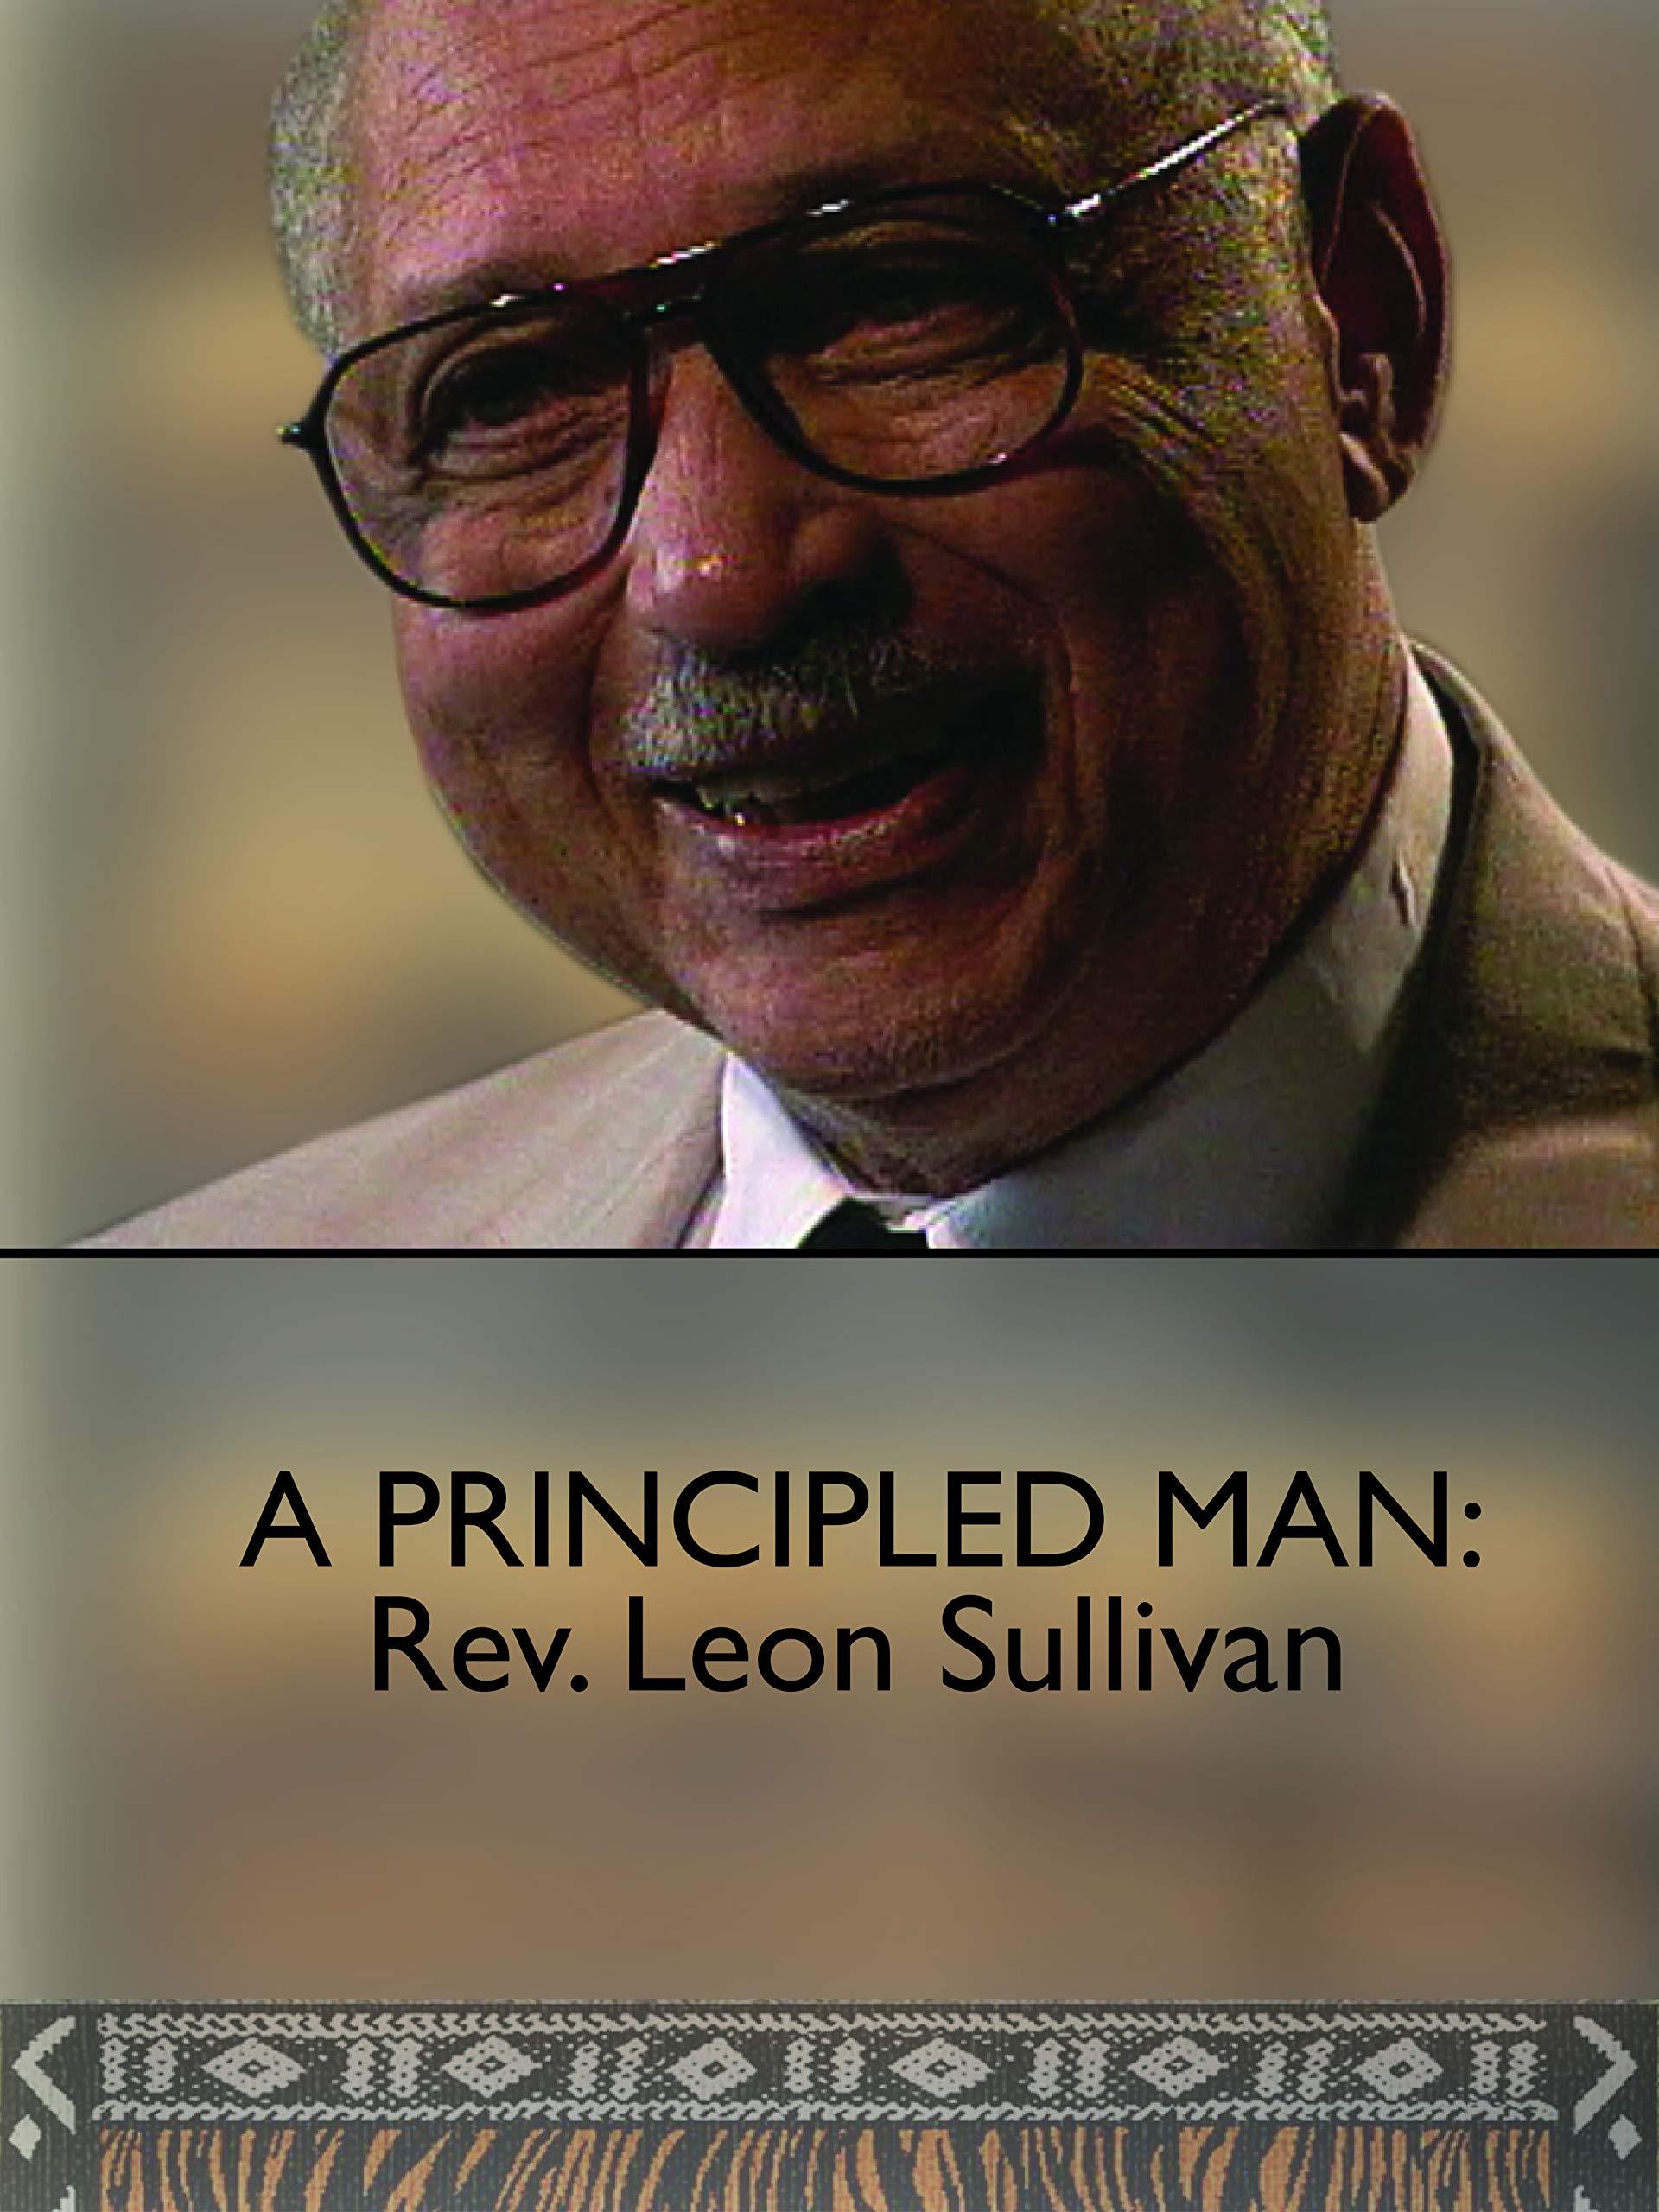 A Principled Man: Rev. Leon Sullivan on Amazon Prime Video UK